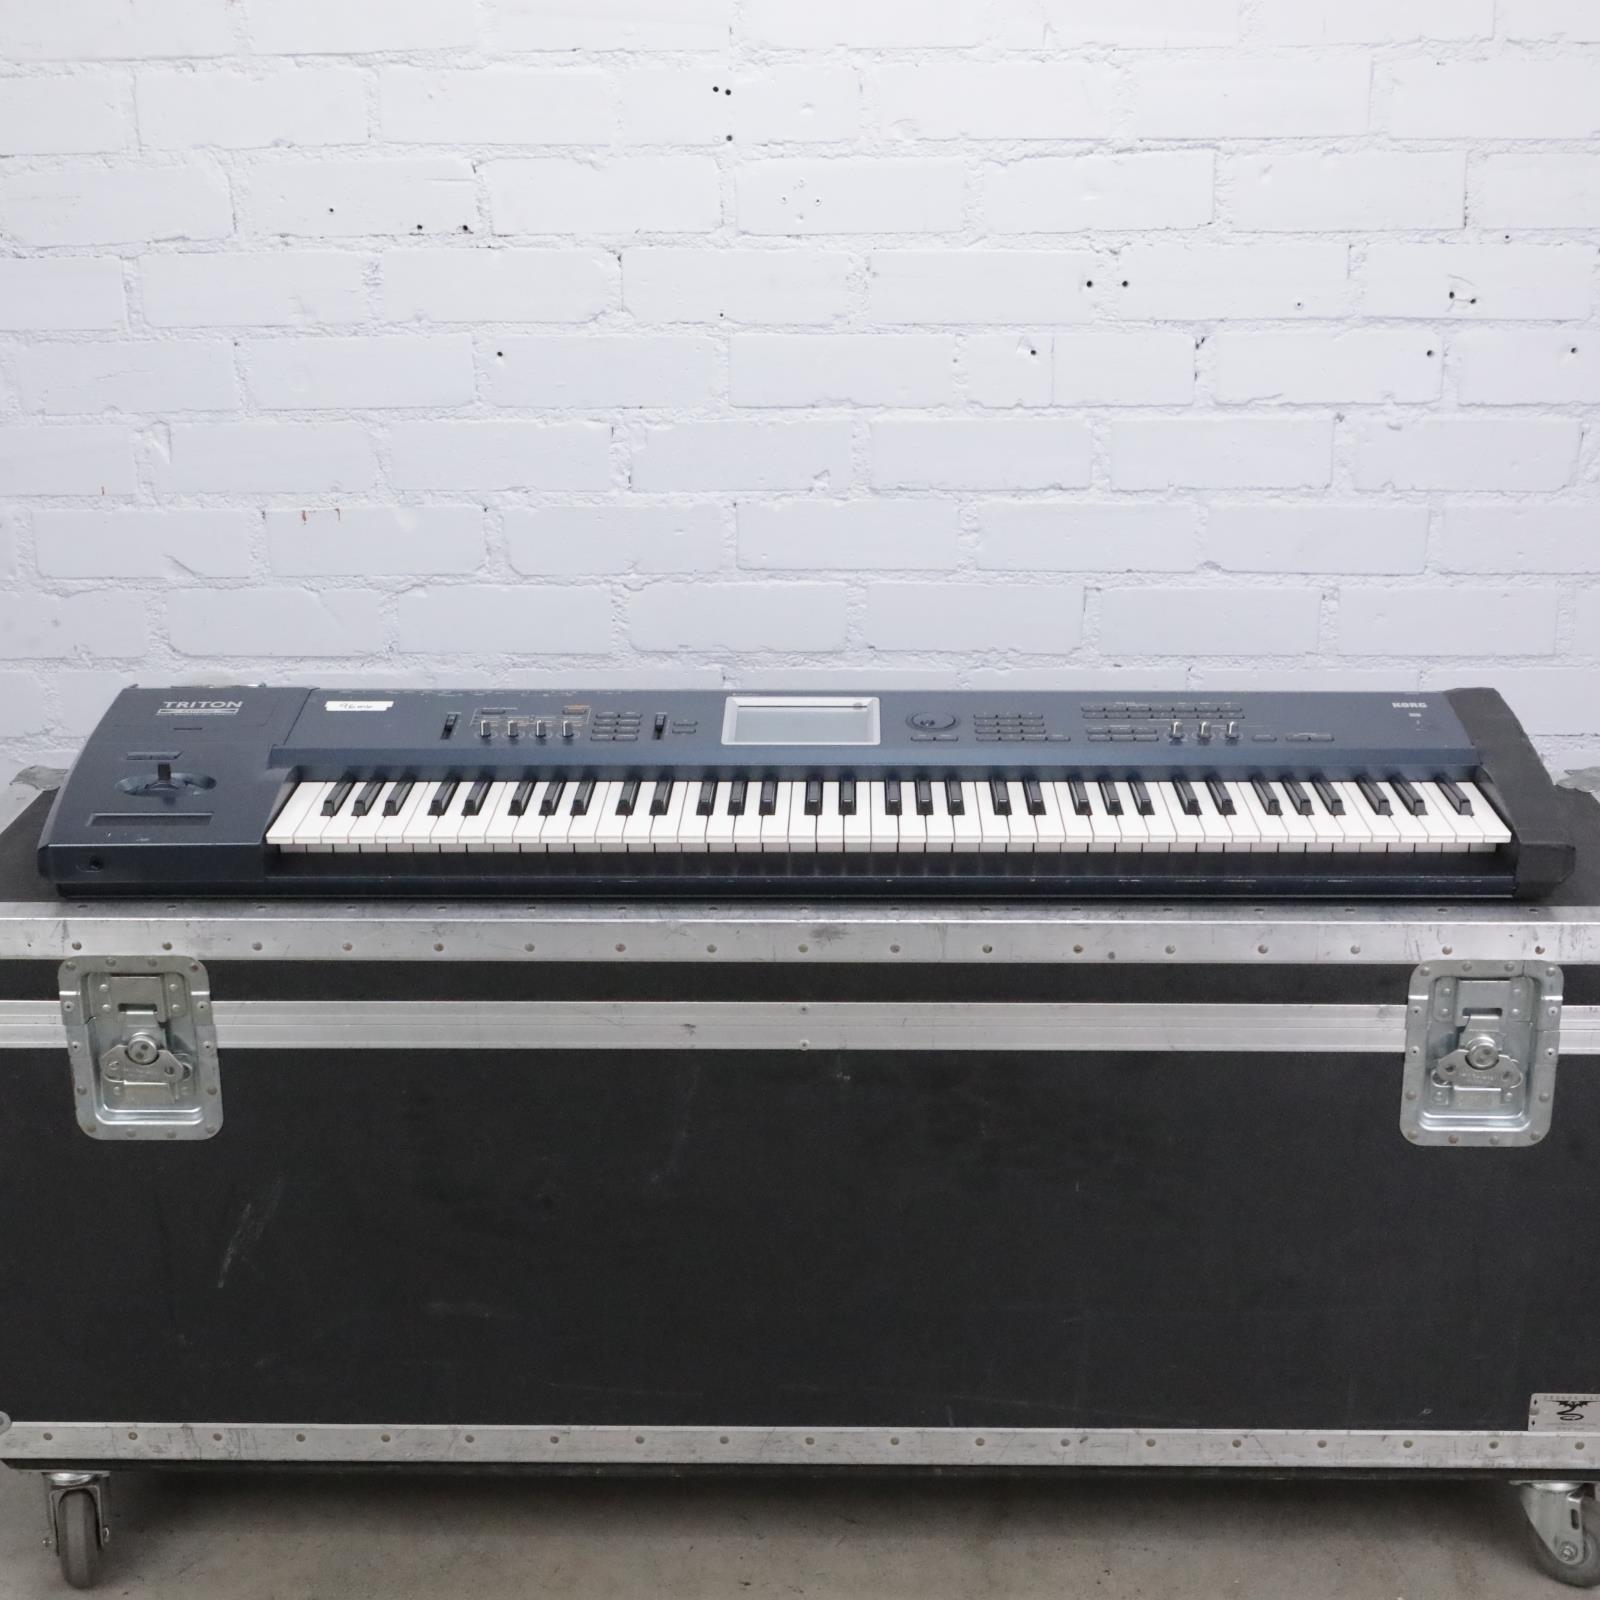 Korg Triton Extreme 76 Workstation / Sampler Keyboard w/ A&S Road Case #41606